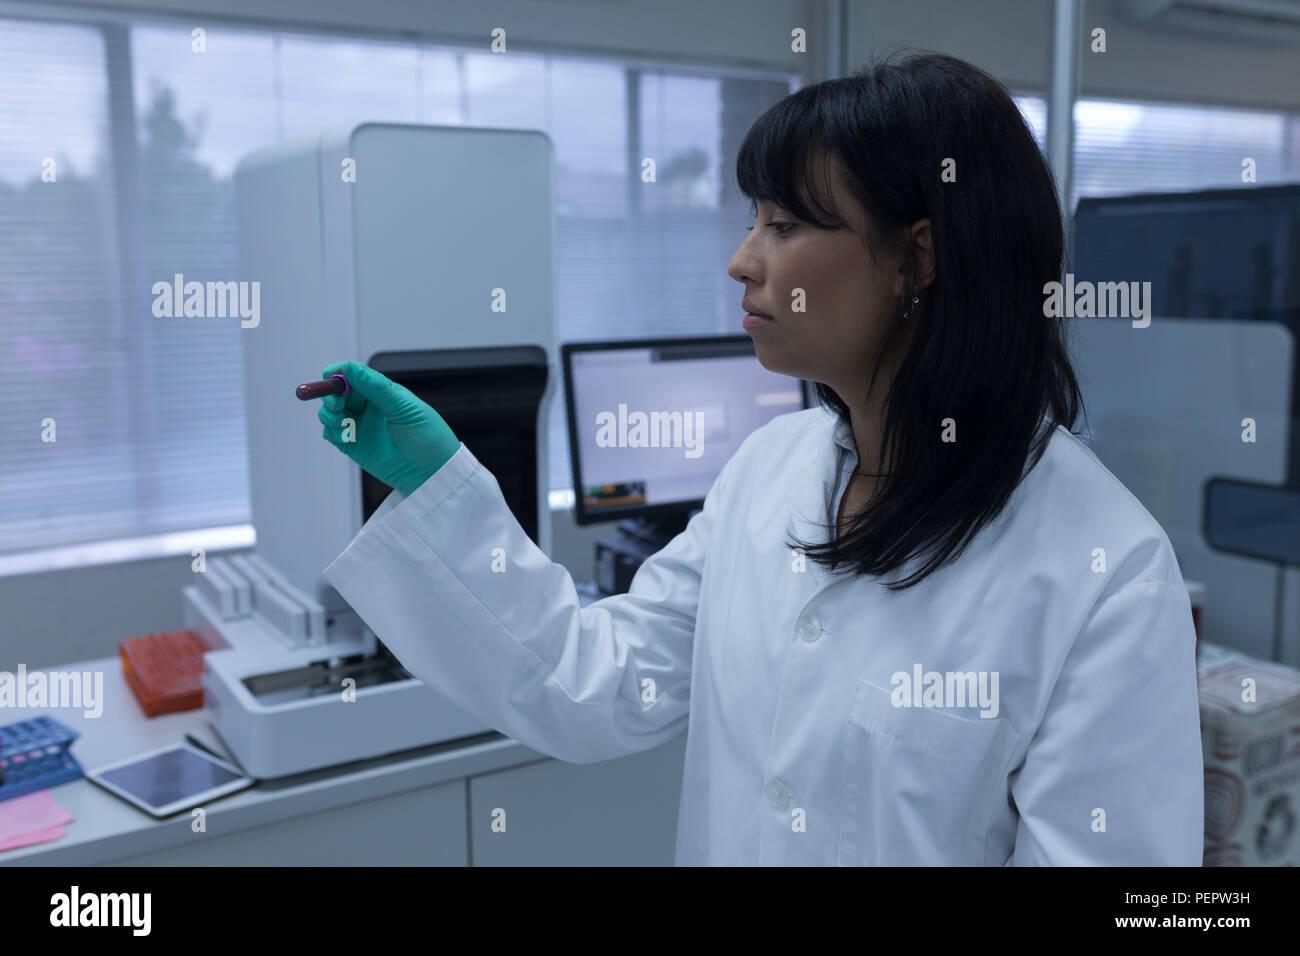 Laboratory technician analyzing chemical solution - Stock Image